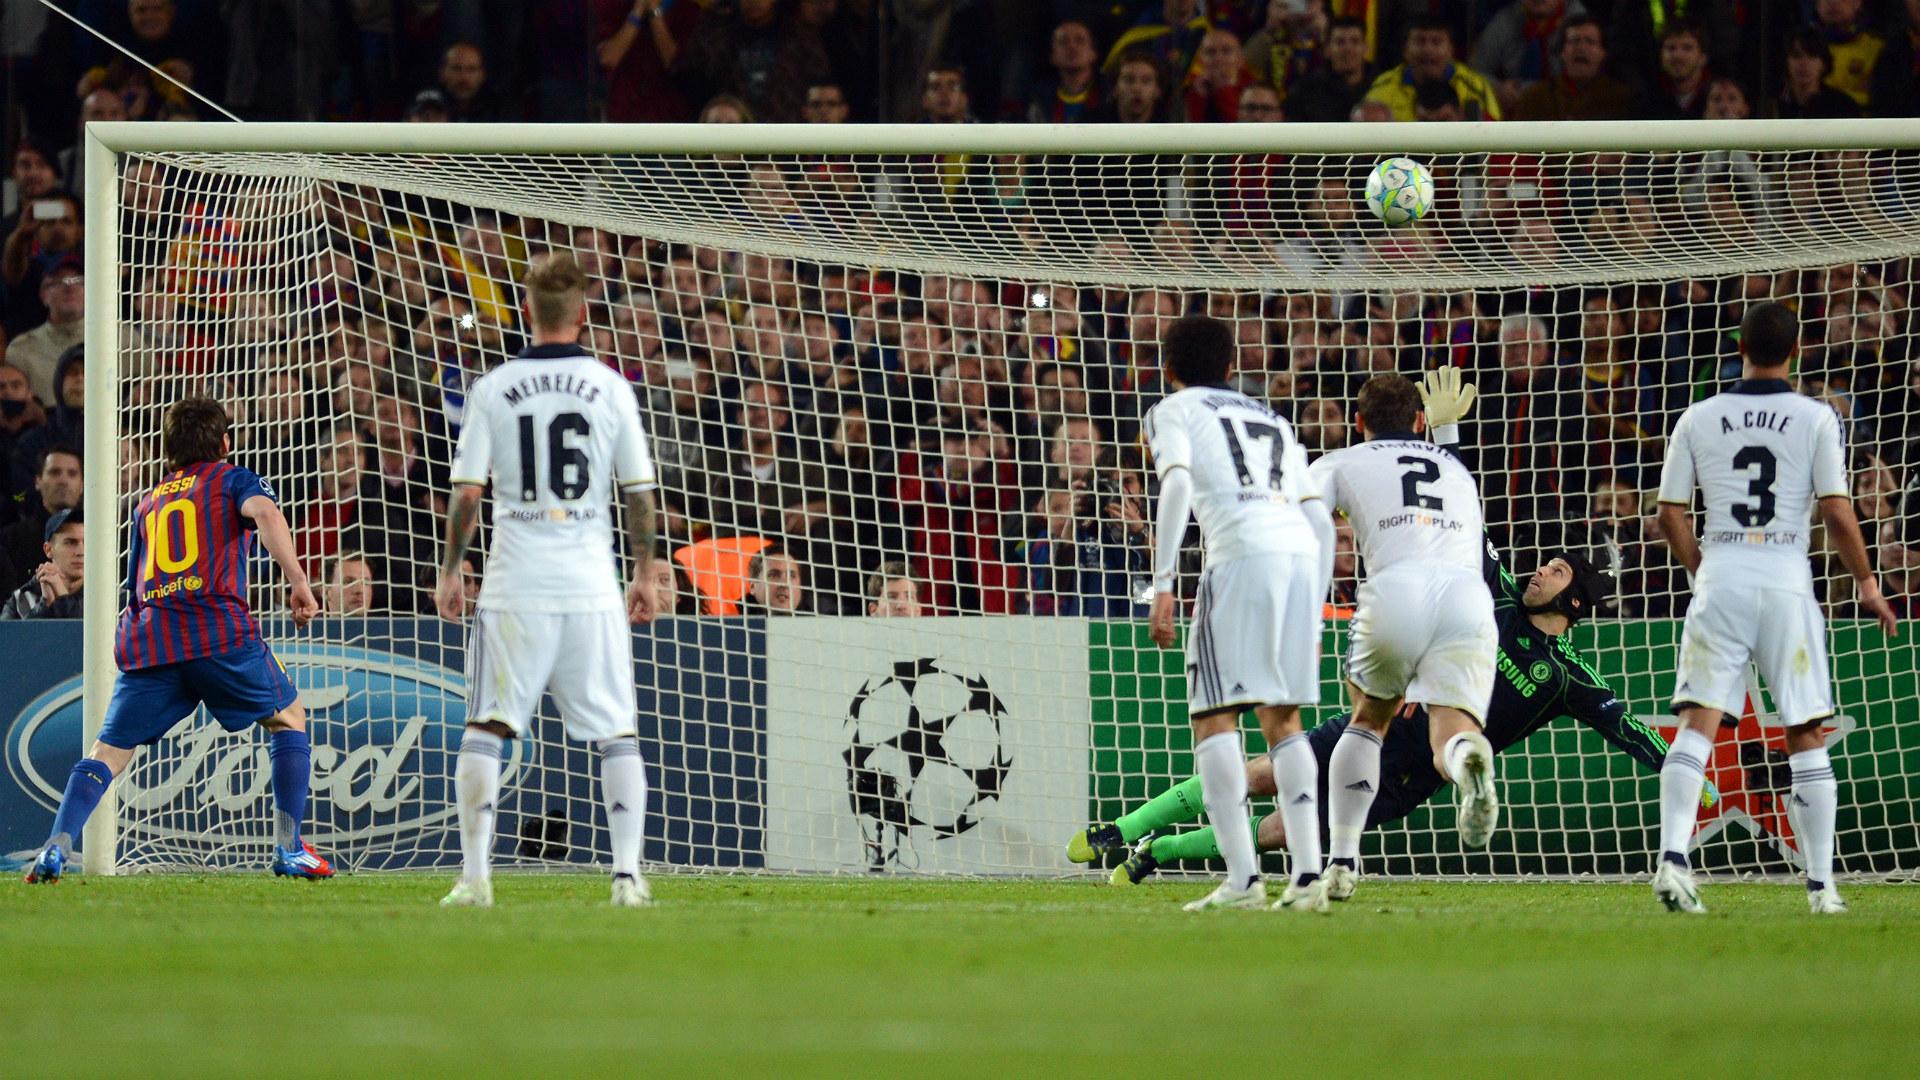 2012 Cech Lionel Messi Chelsea Barcelona